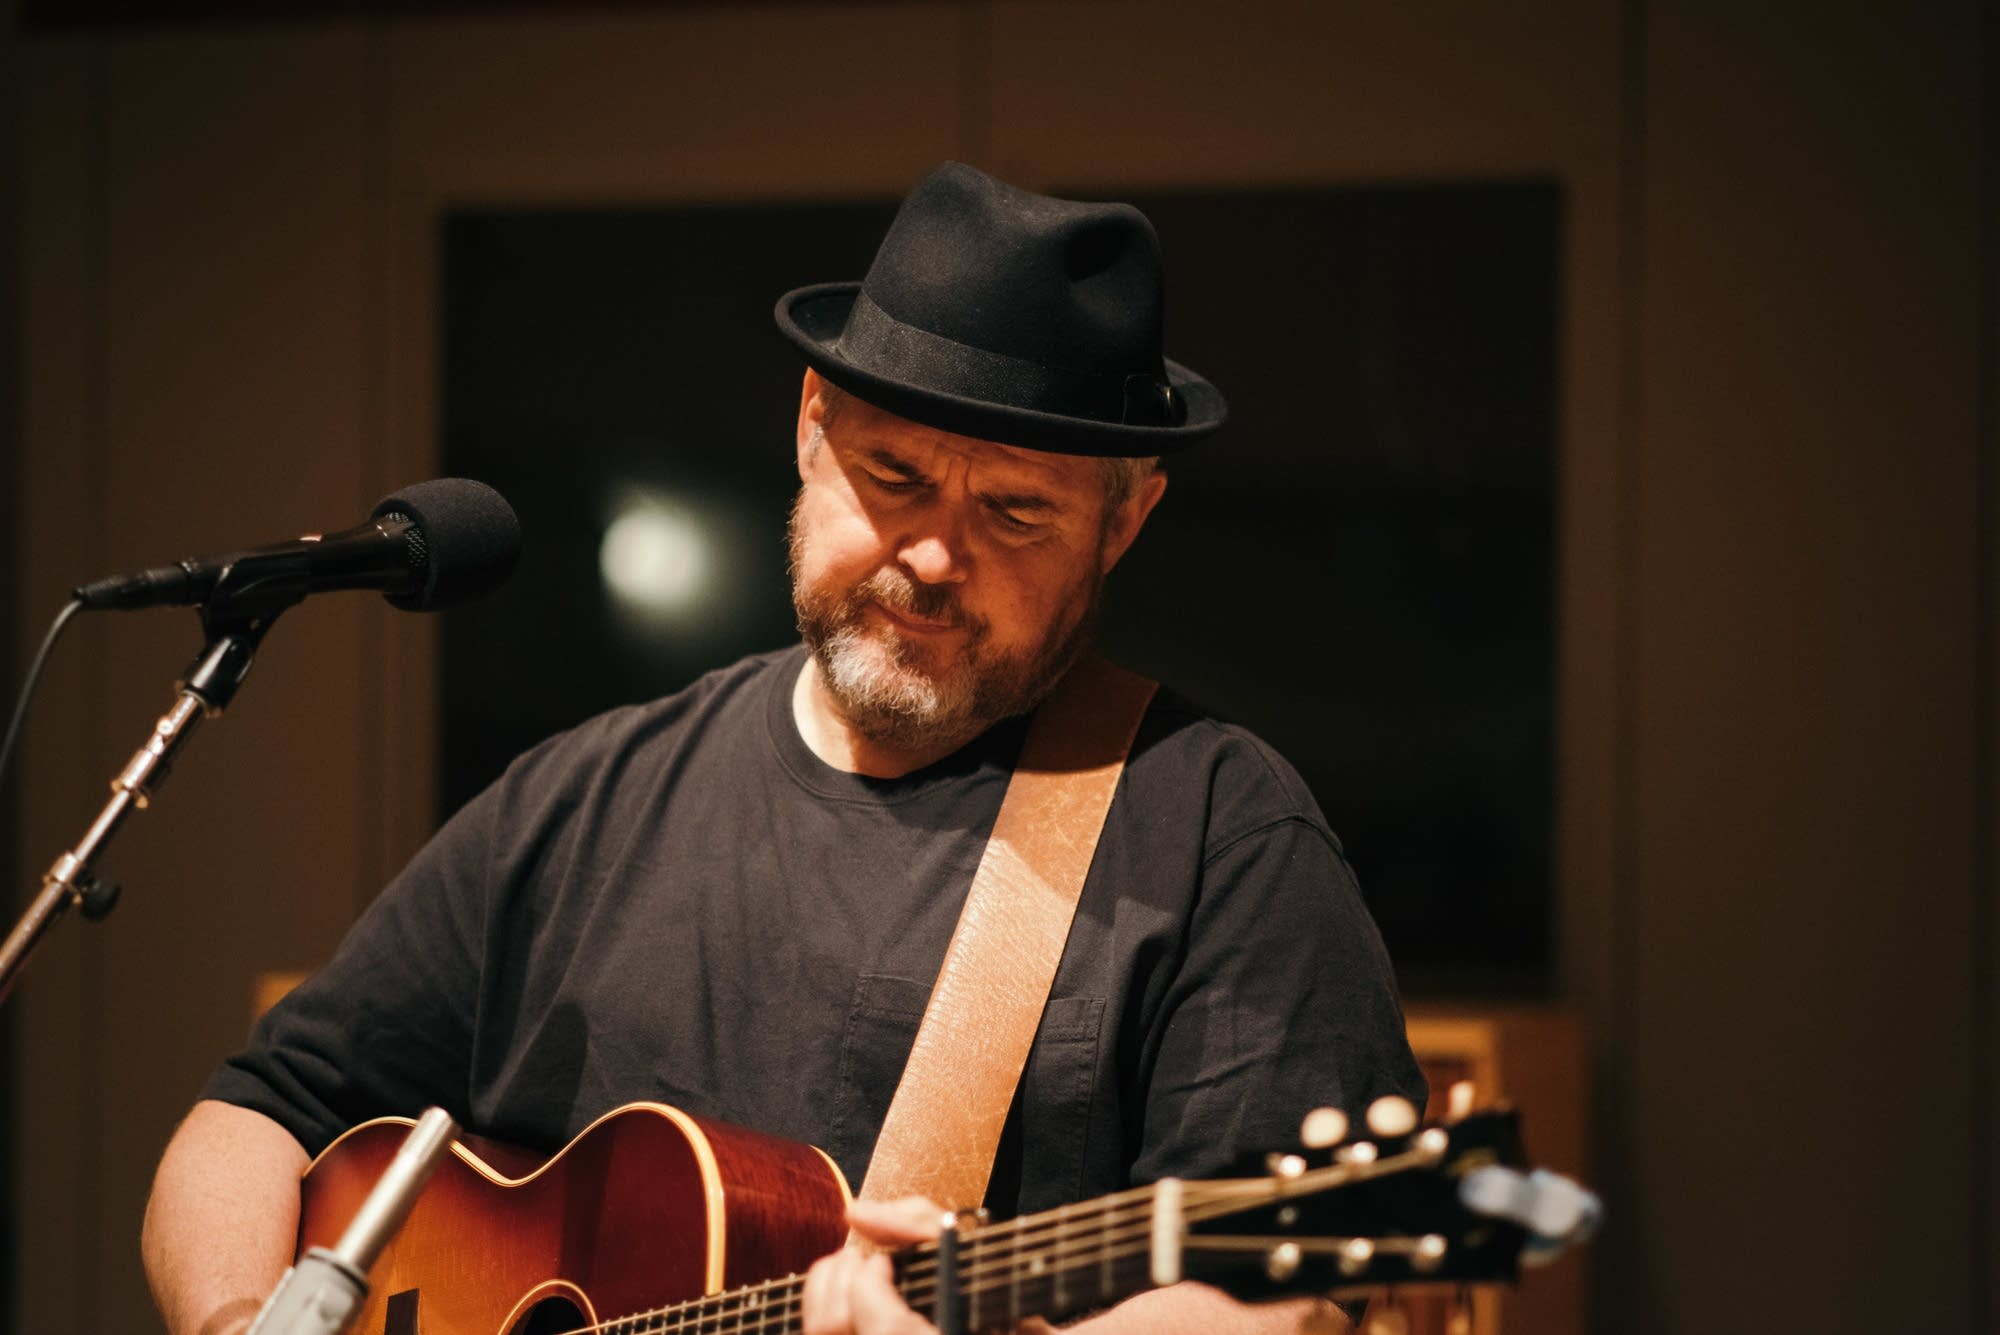 John Louis performs in the Radio Heartland studio